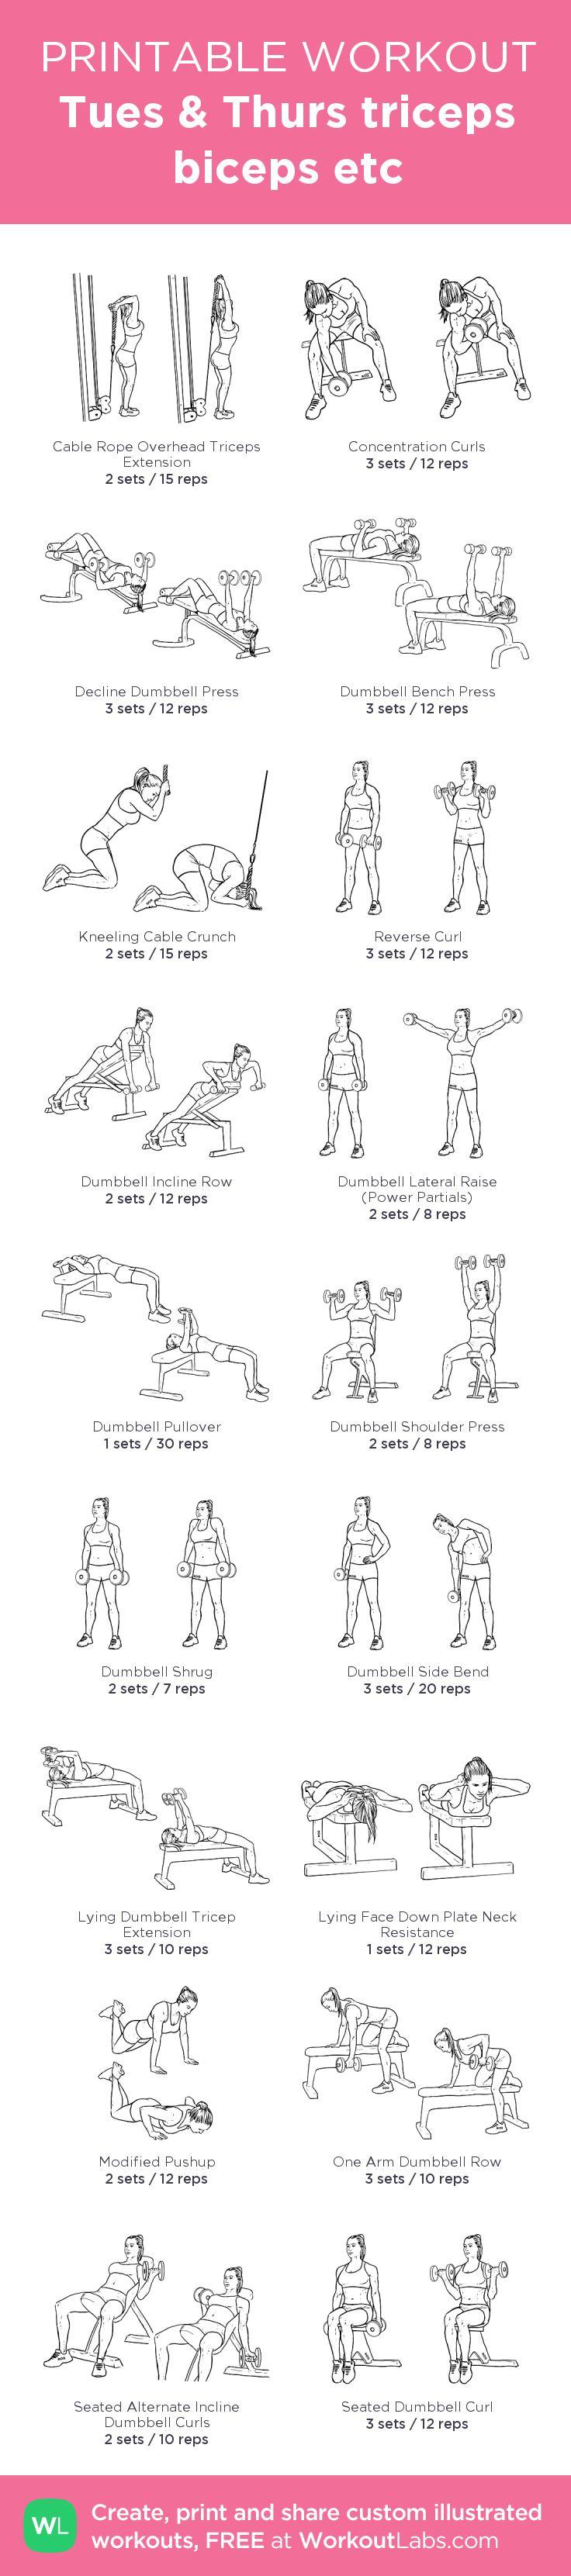 Tues & Thurs triceps biceps etc:my custom printable workout by @WorkoutLabs #workoutlabs #customworkout